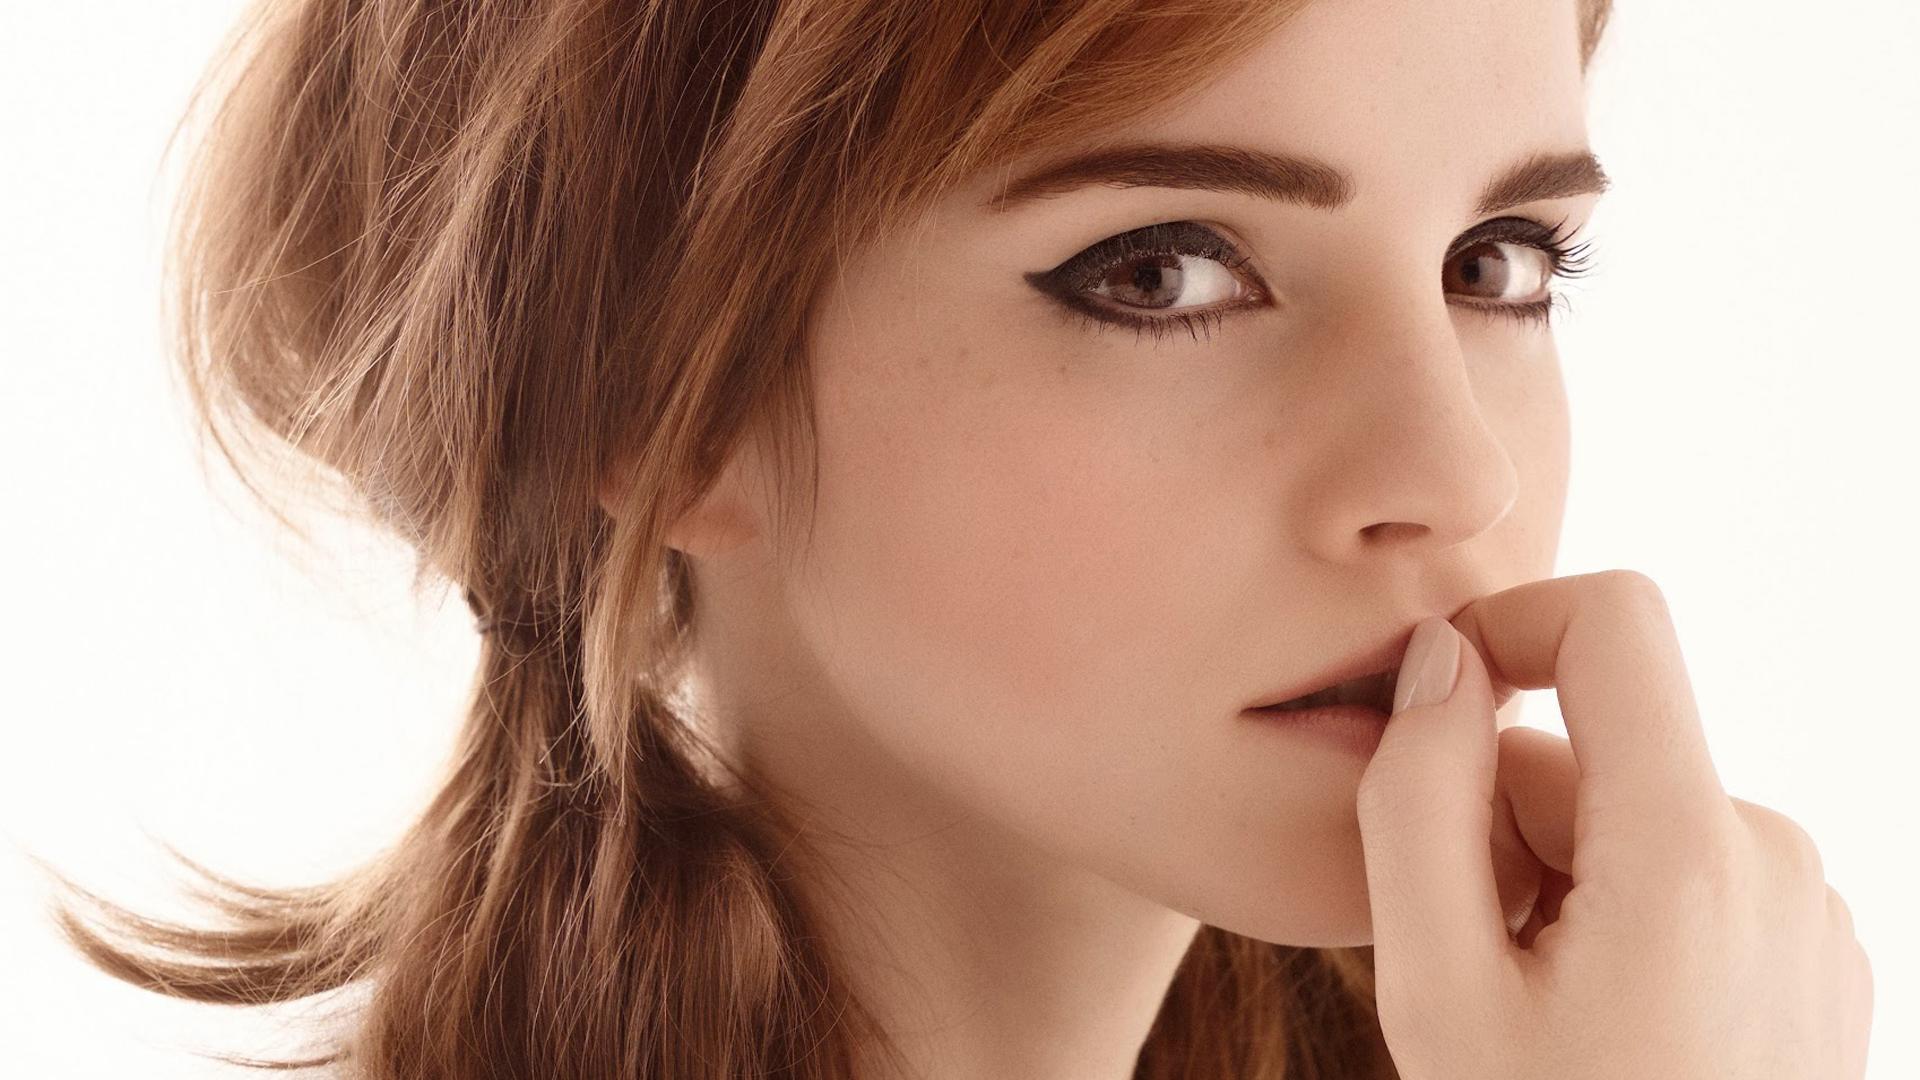 Hd wallpaper emma watson - 38 Beautiful Hd Emma Watson Wallpapers